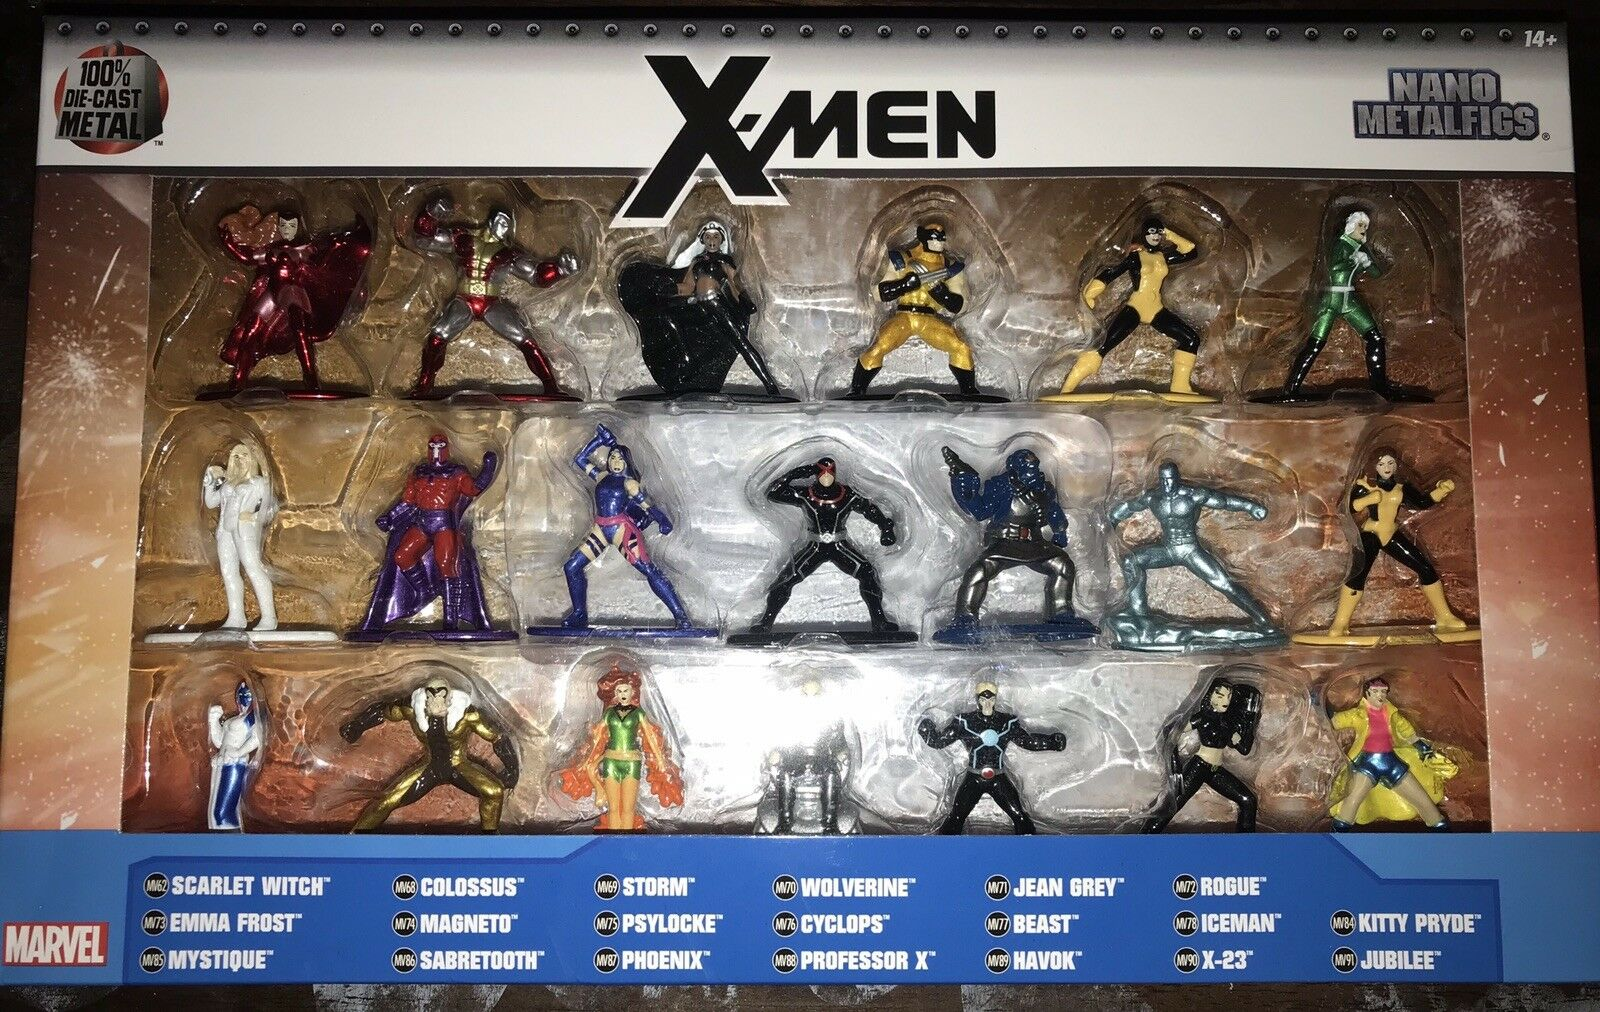 Jada Toys Marvel Die Cast Metal Xmen Complete Figure Set 21 Pcs